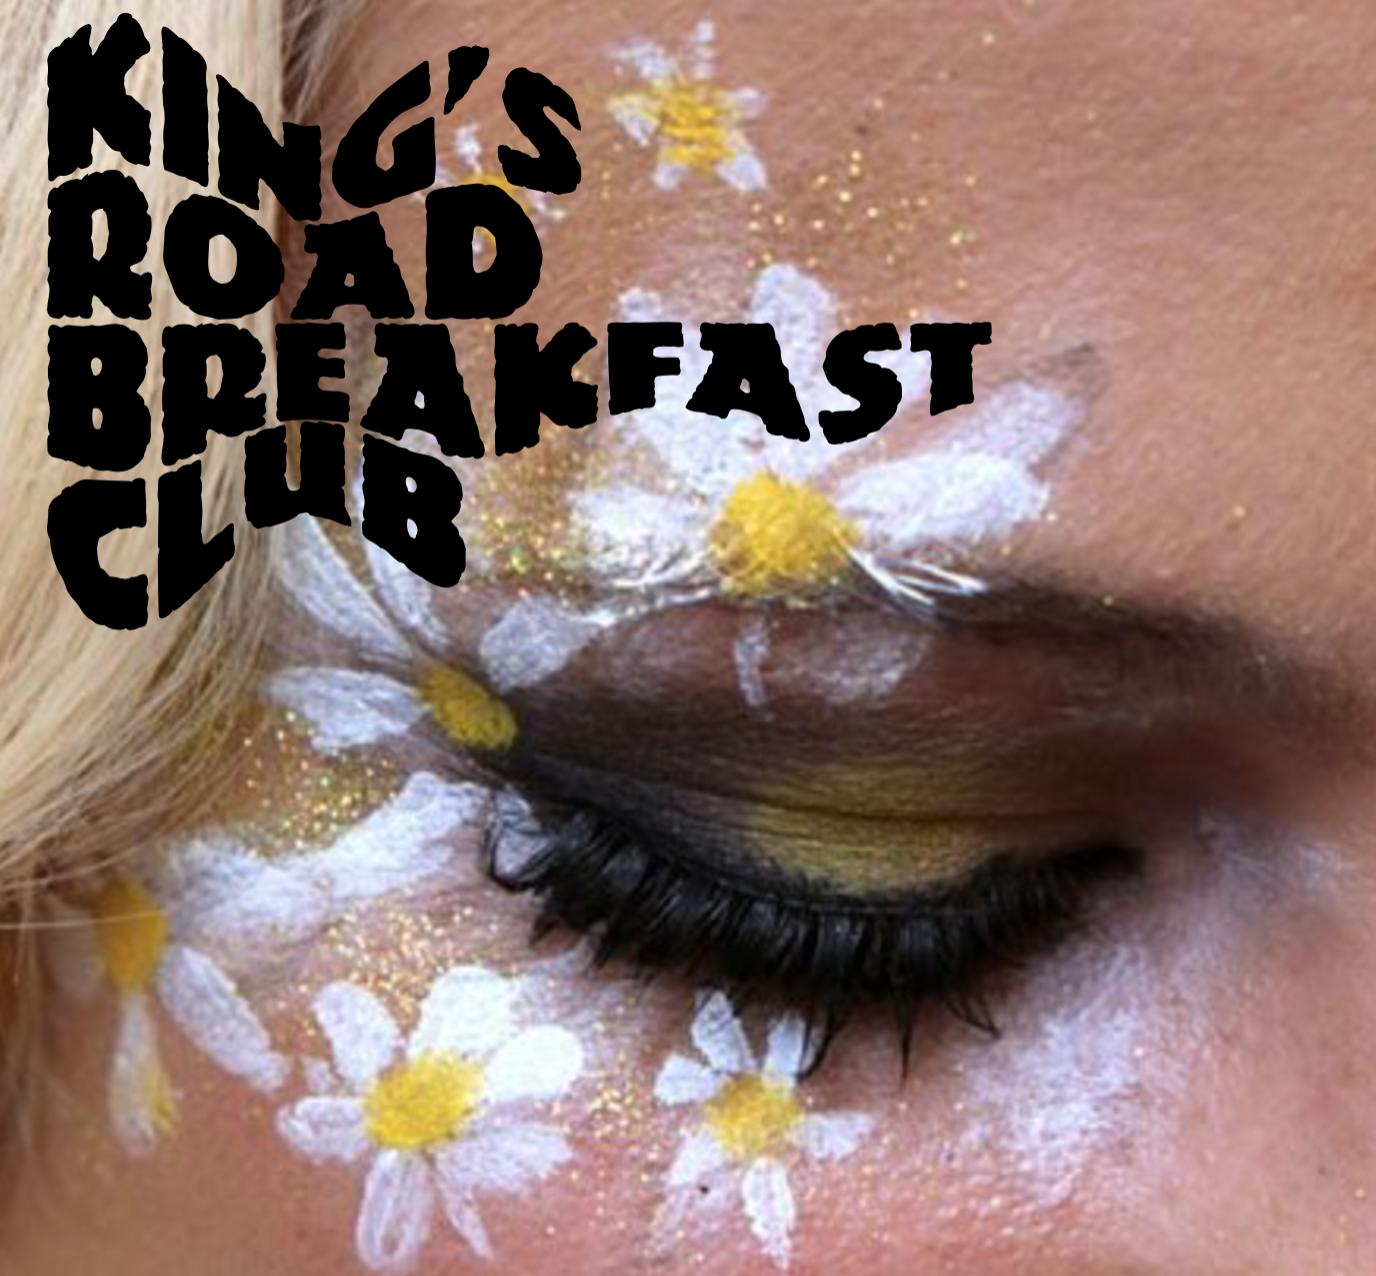 King's Road Breakfast Club